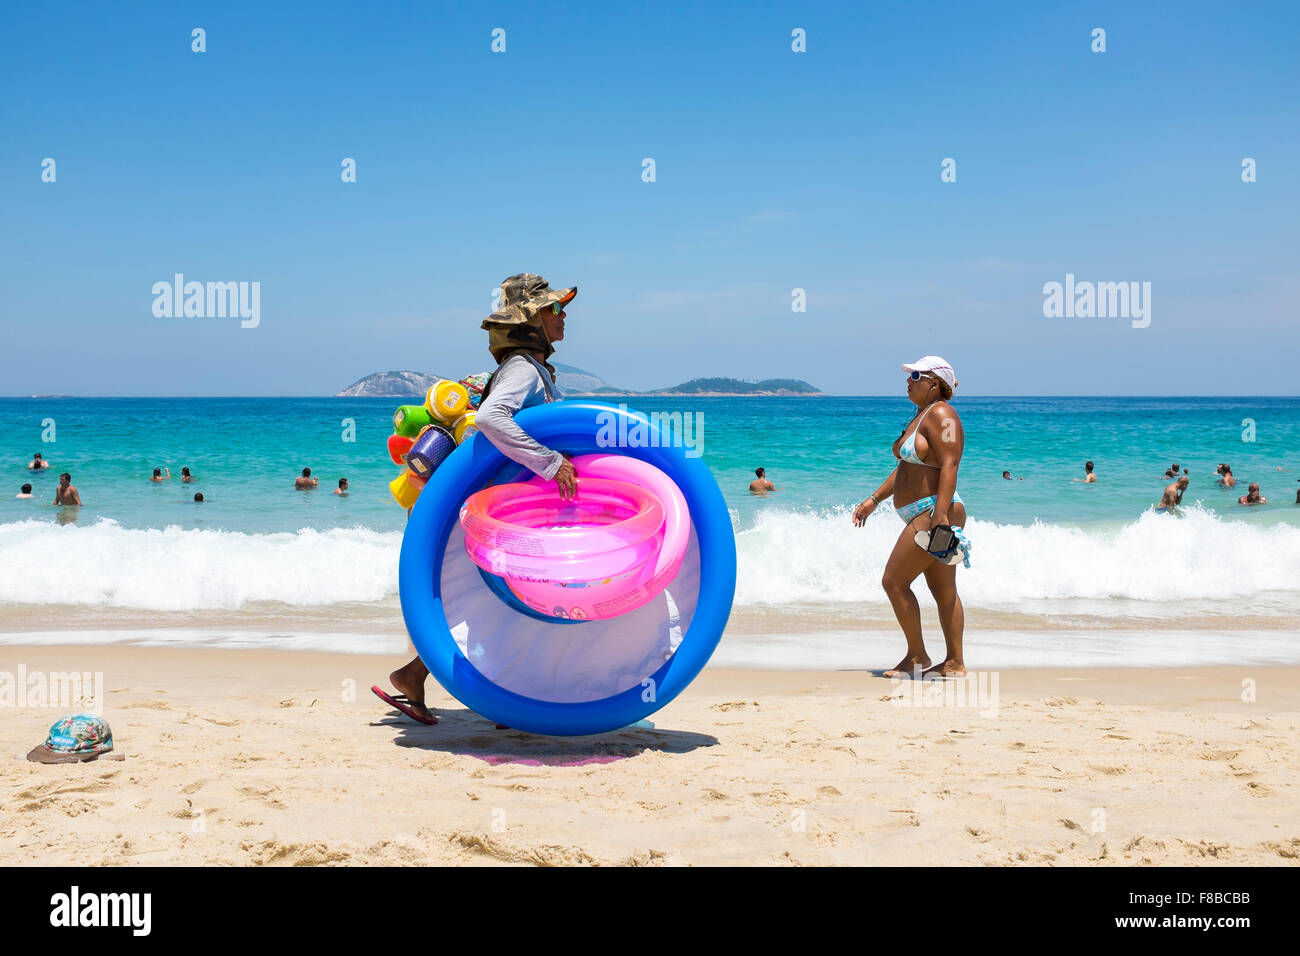 RIO DE JANEIRO, BRAZIL - MARCH 15, 2015: Beach vendor selling colorful beach toys carries his merchandise along - Stock Image